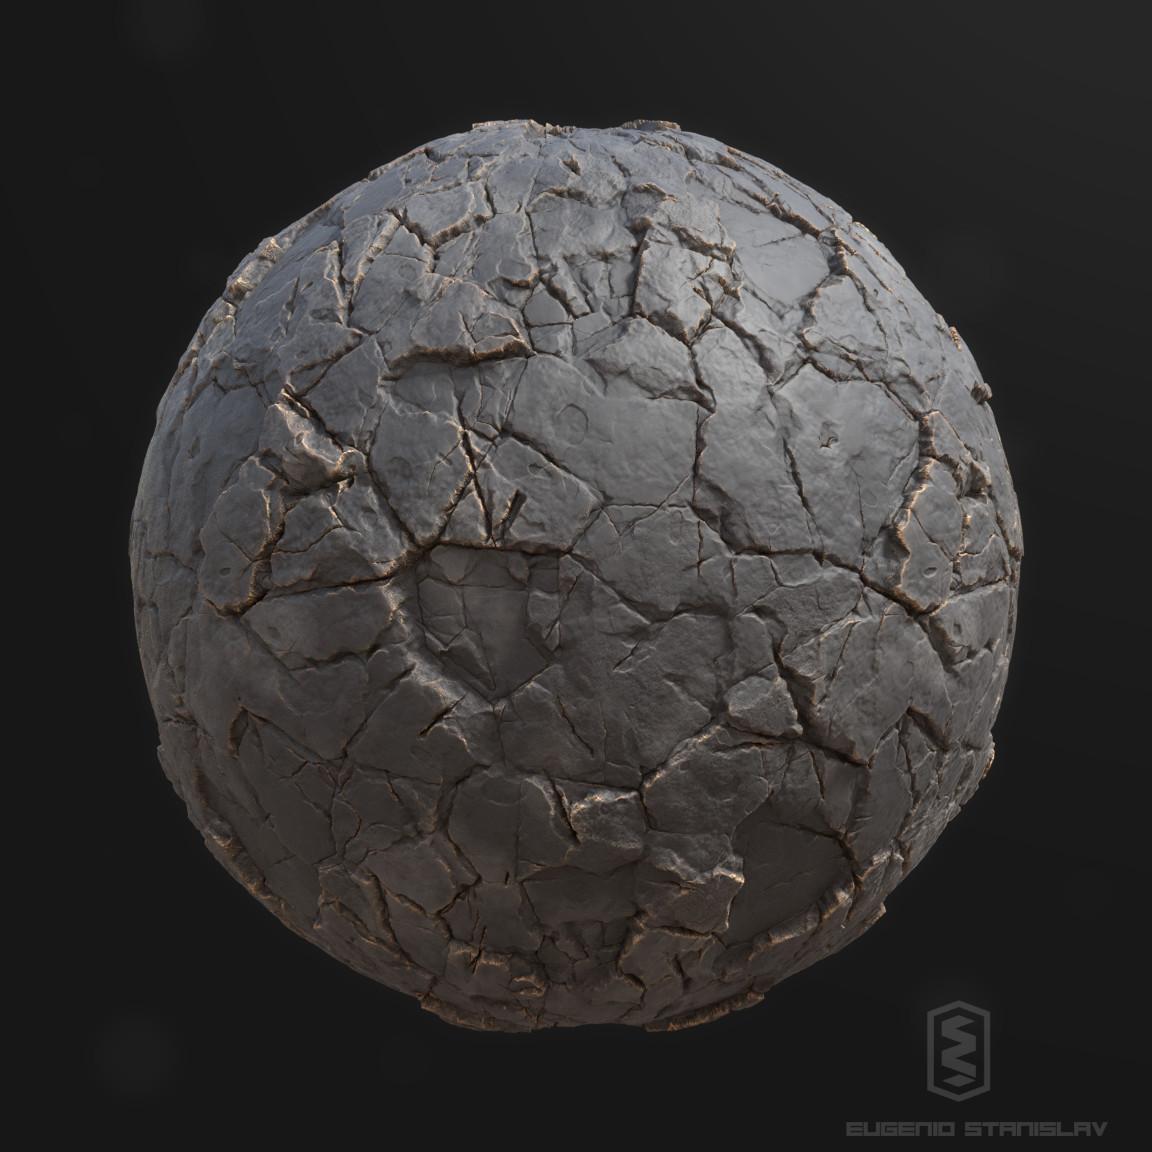 Eugenio stanislav stylized broken stone render s